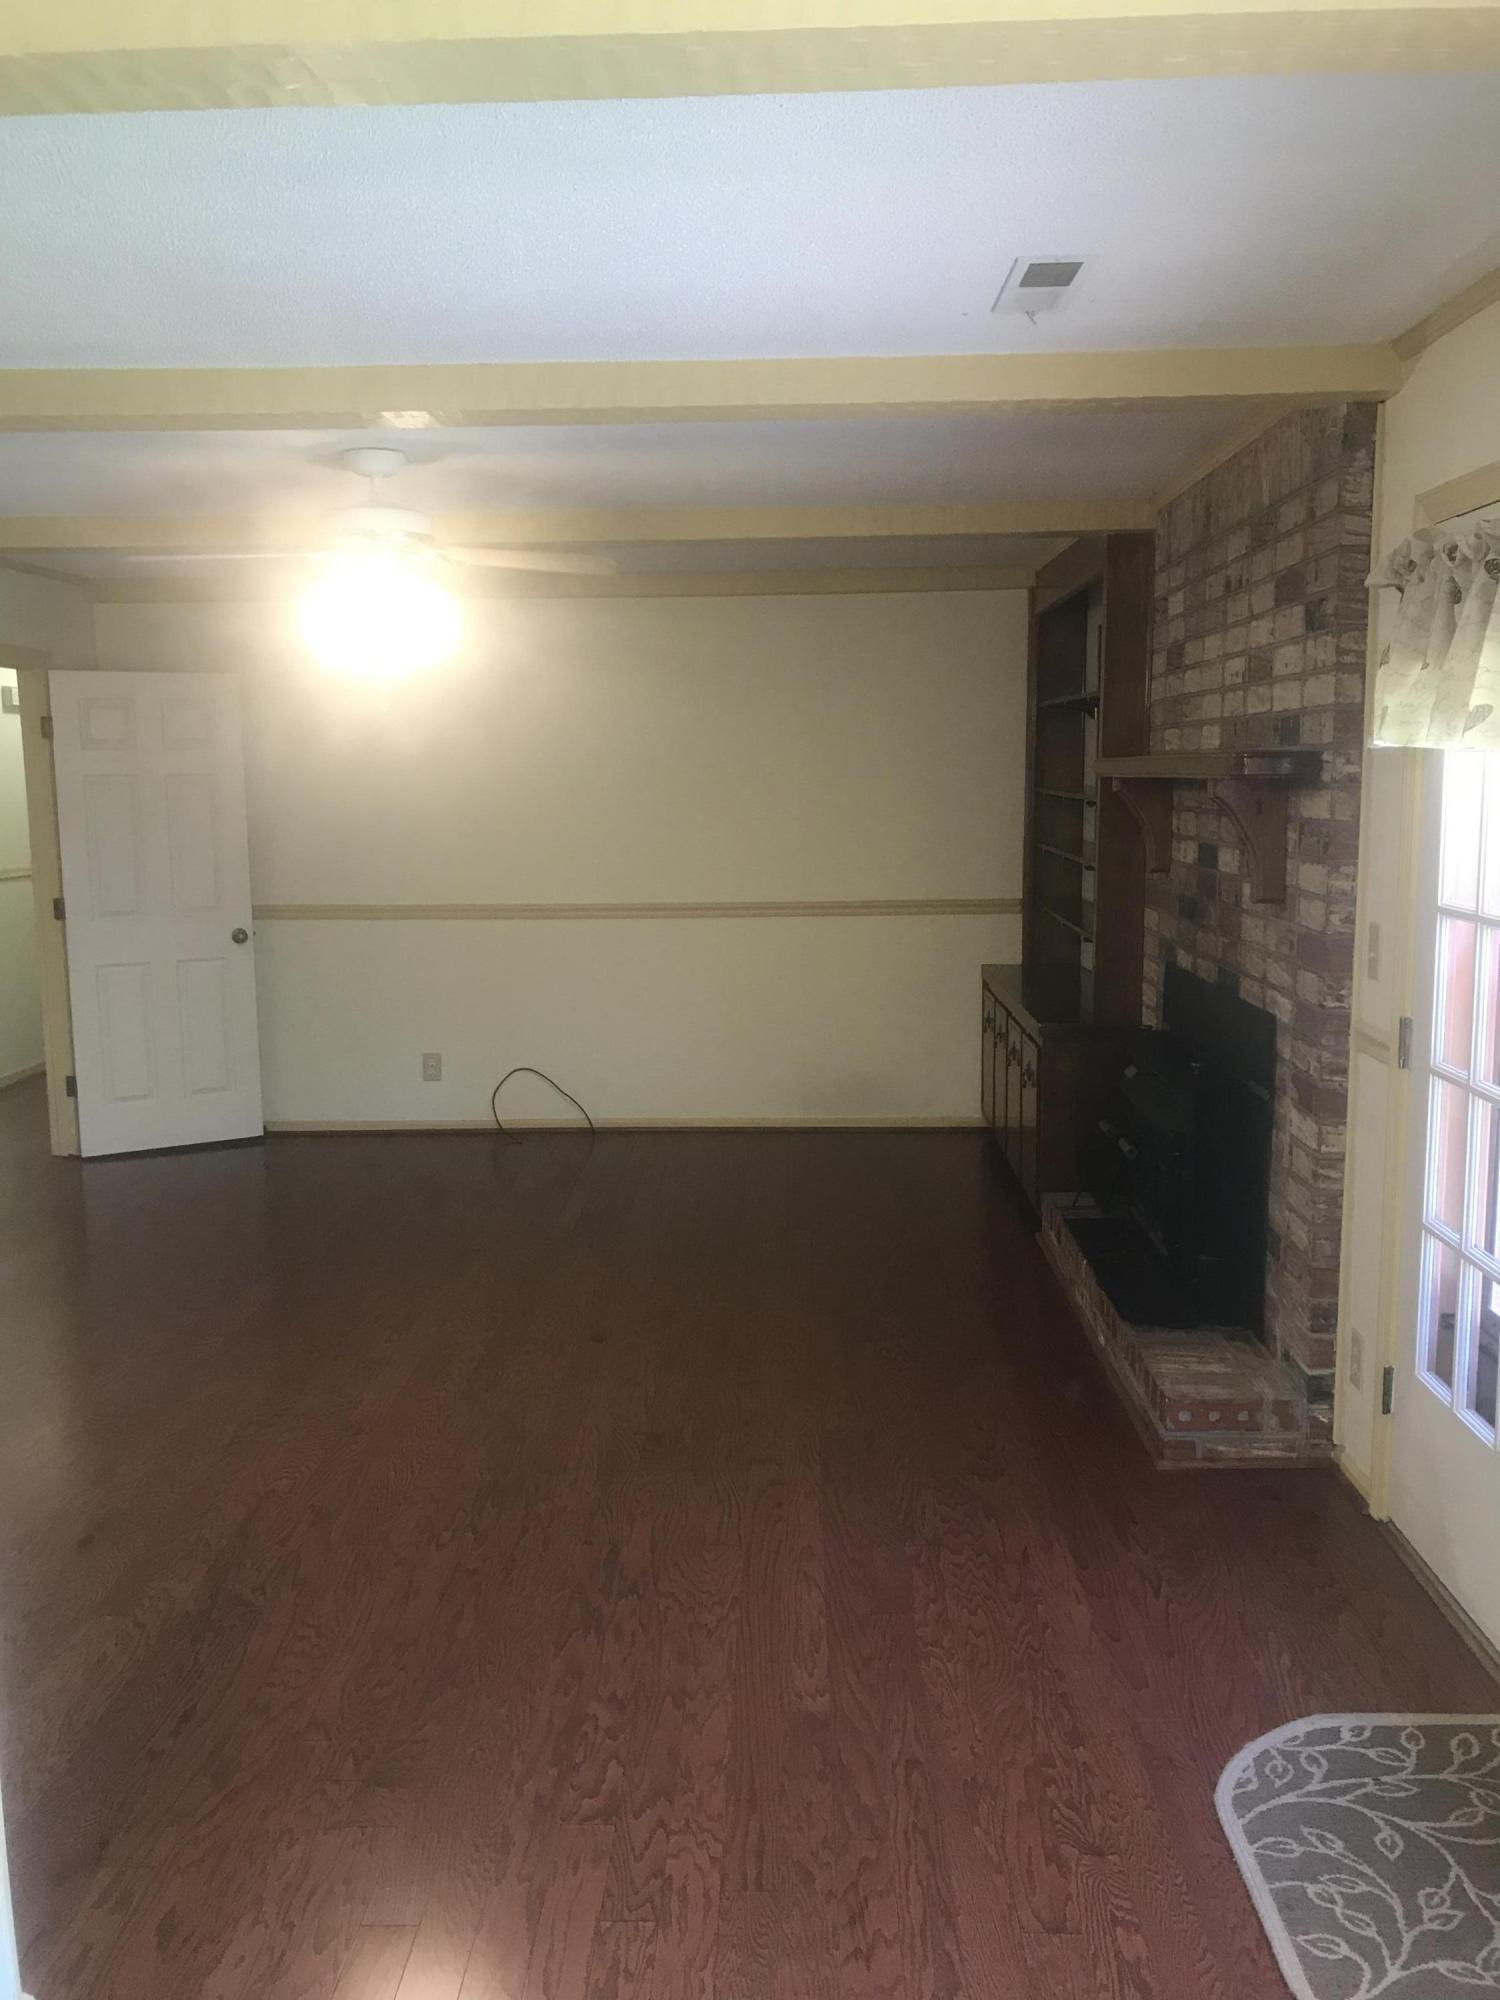 Harborgate Shores Homes For Sale - 1413 Harborgate, Mount Pleasant, SC - 15